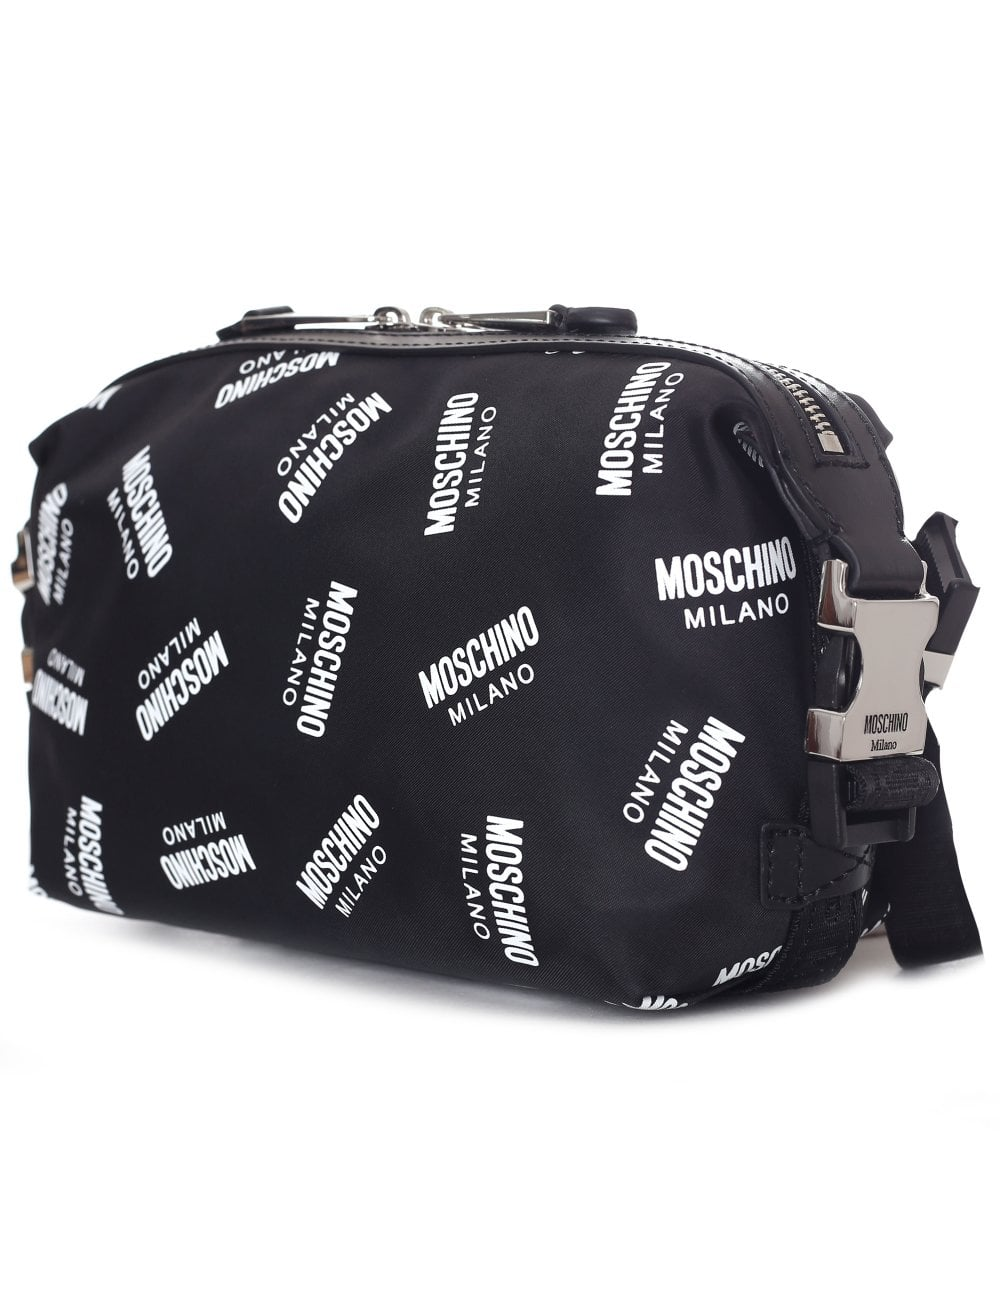 6b927cb598 Moschino Couture Women's All Over Logo Bum Bag